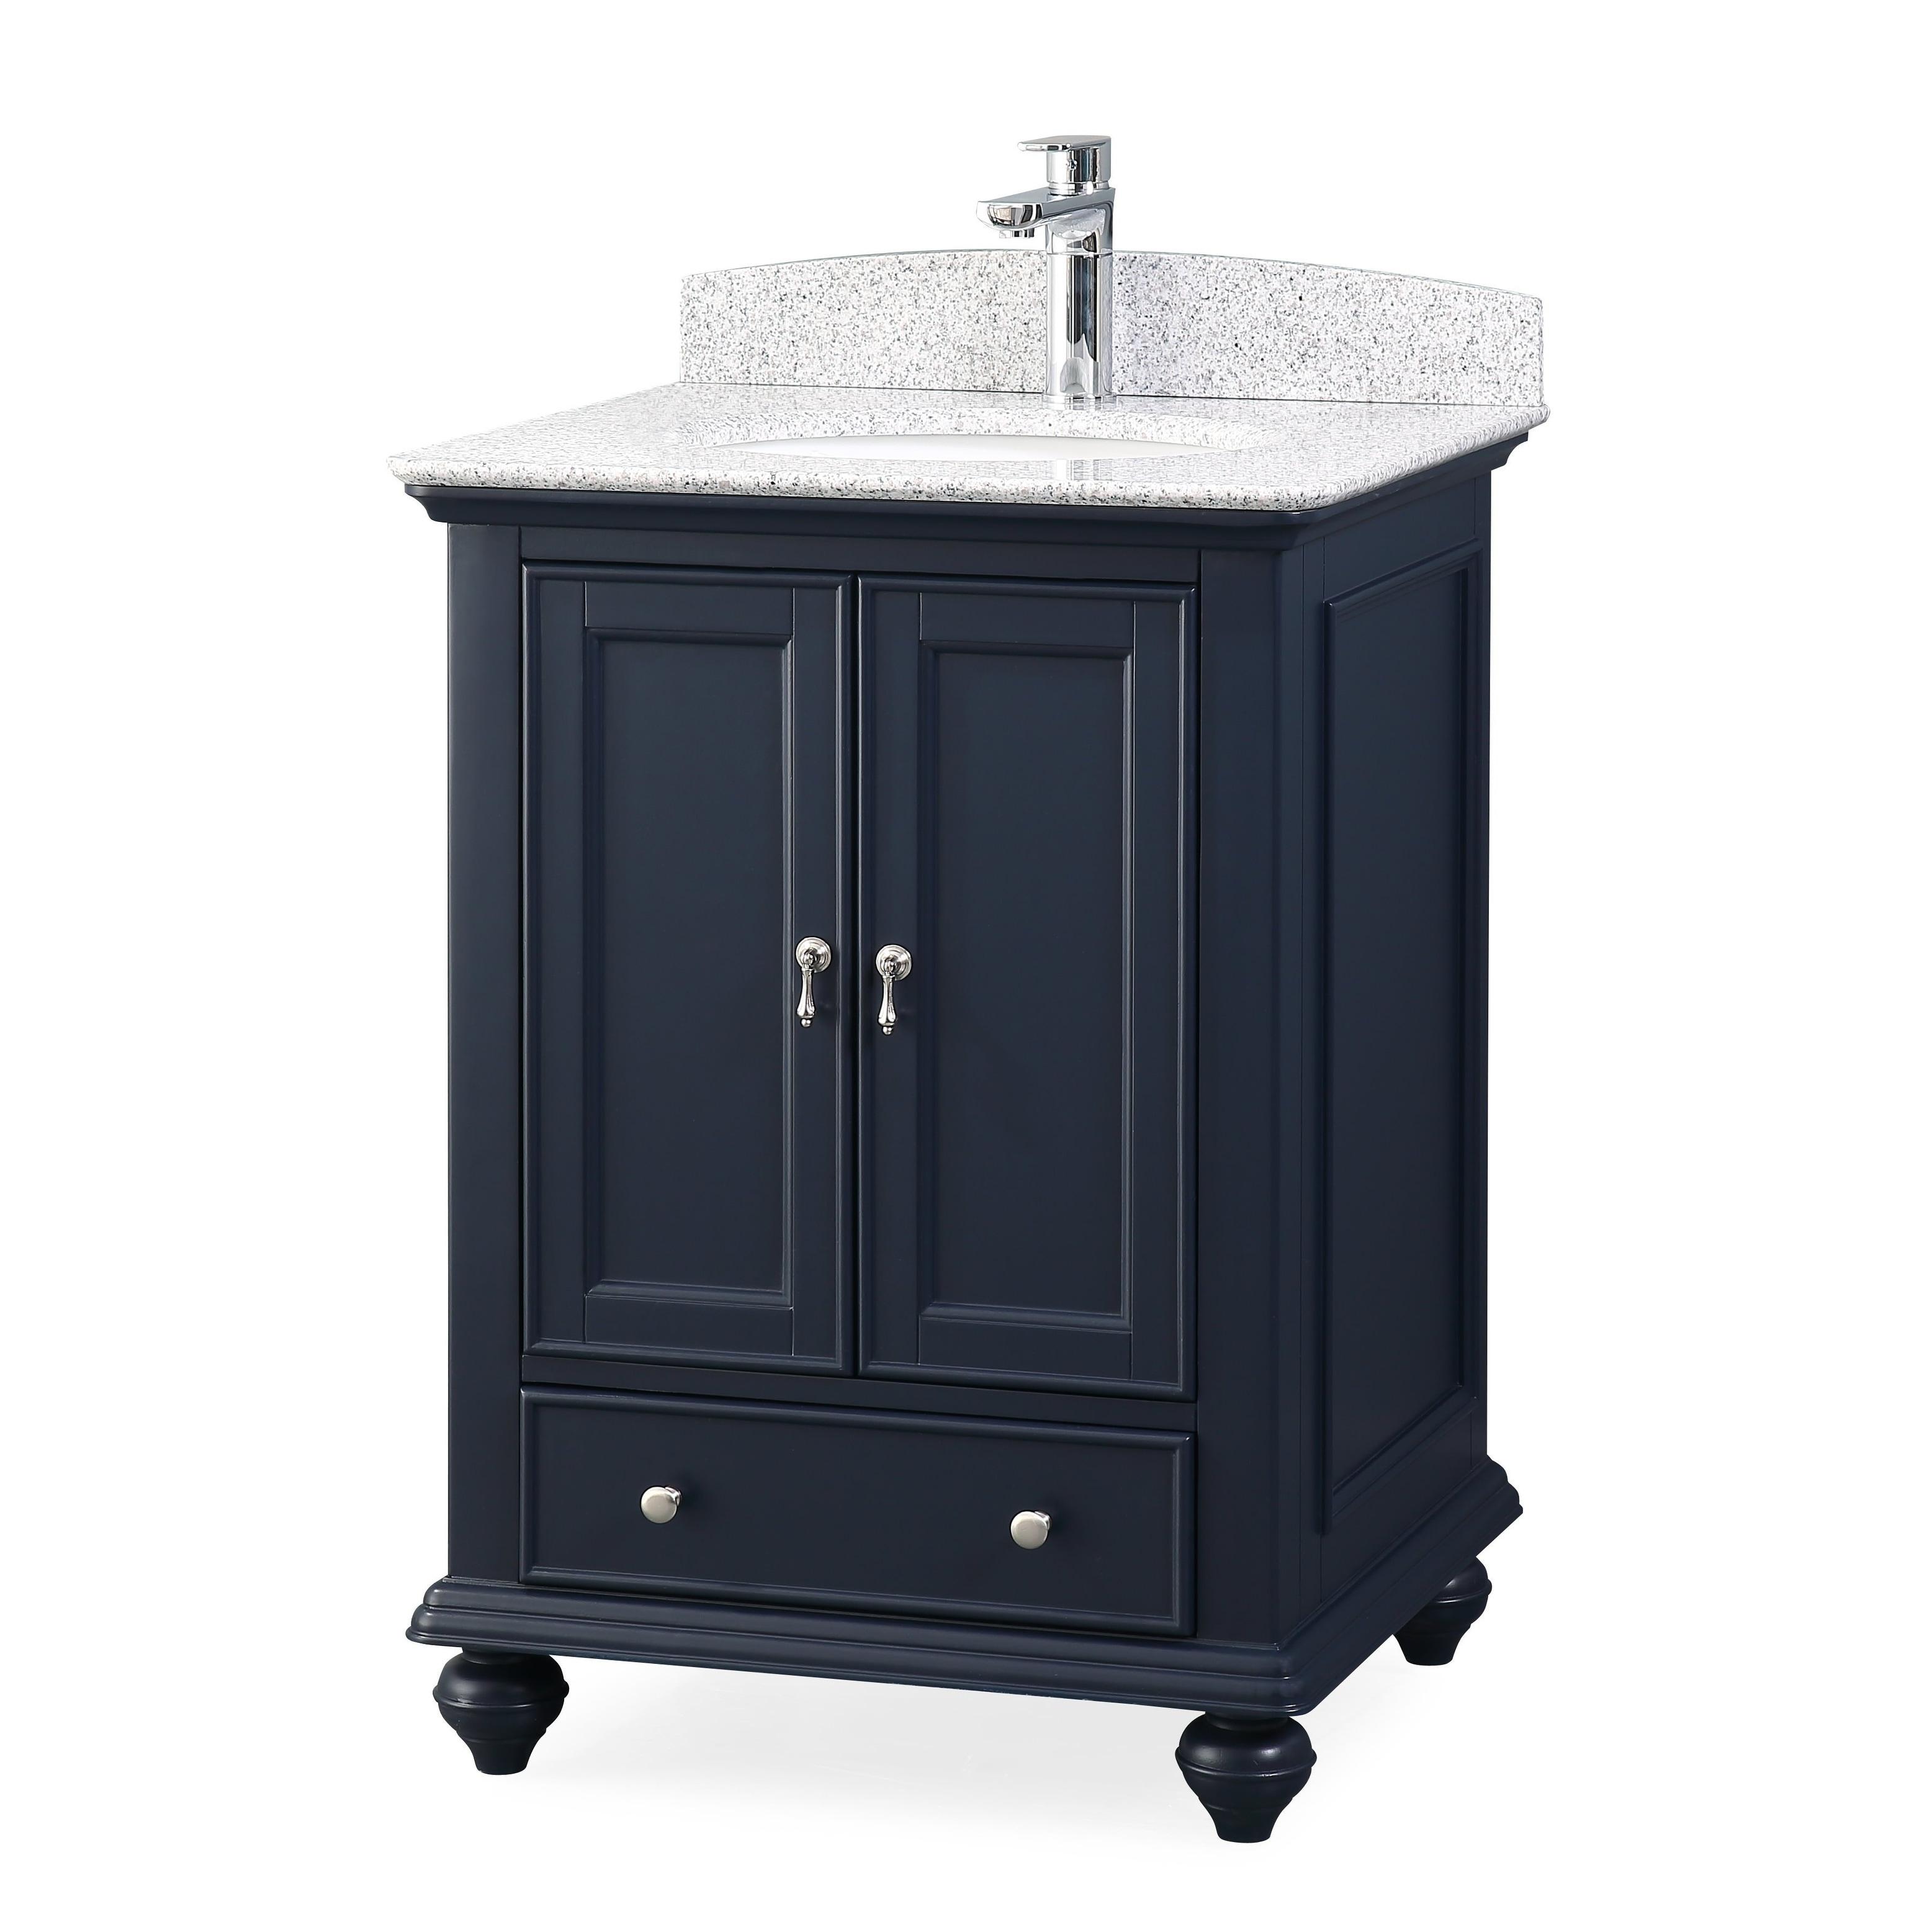 25 Tennant Brand Gillian Powder Room Navy Blue Bathroom Vanity Overstock 27193451